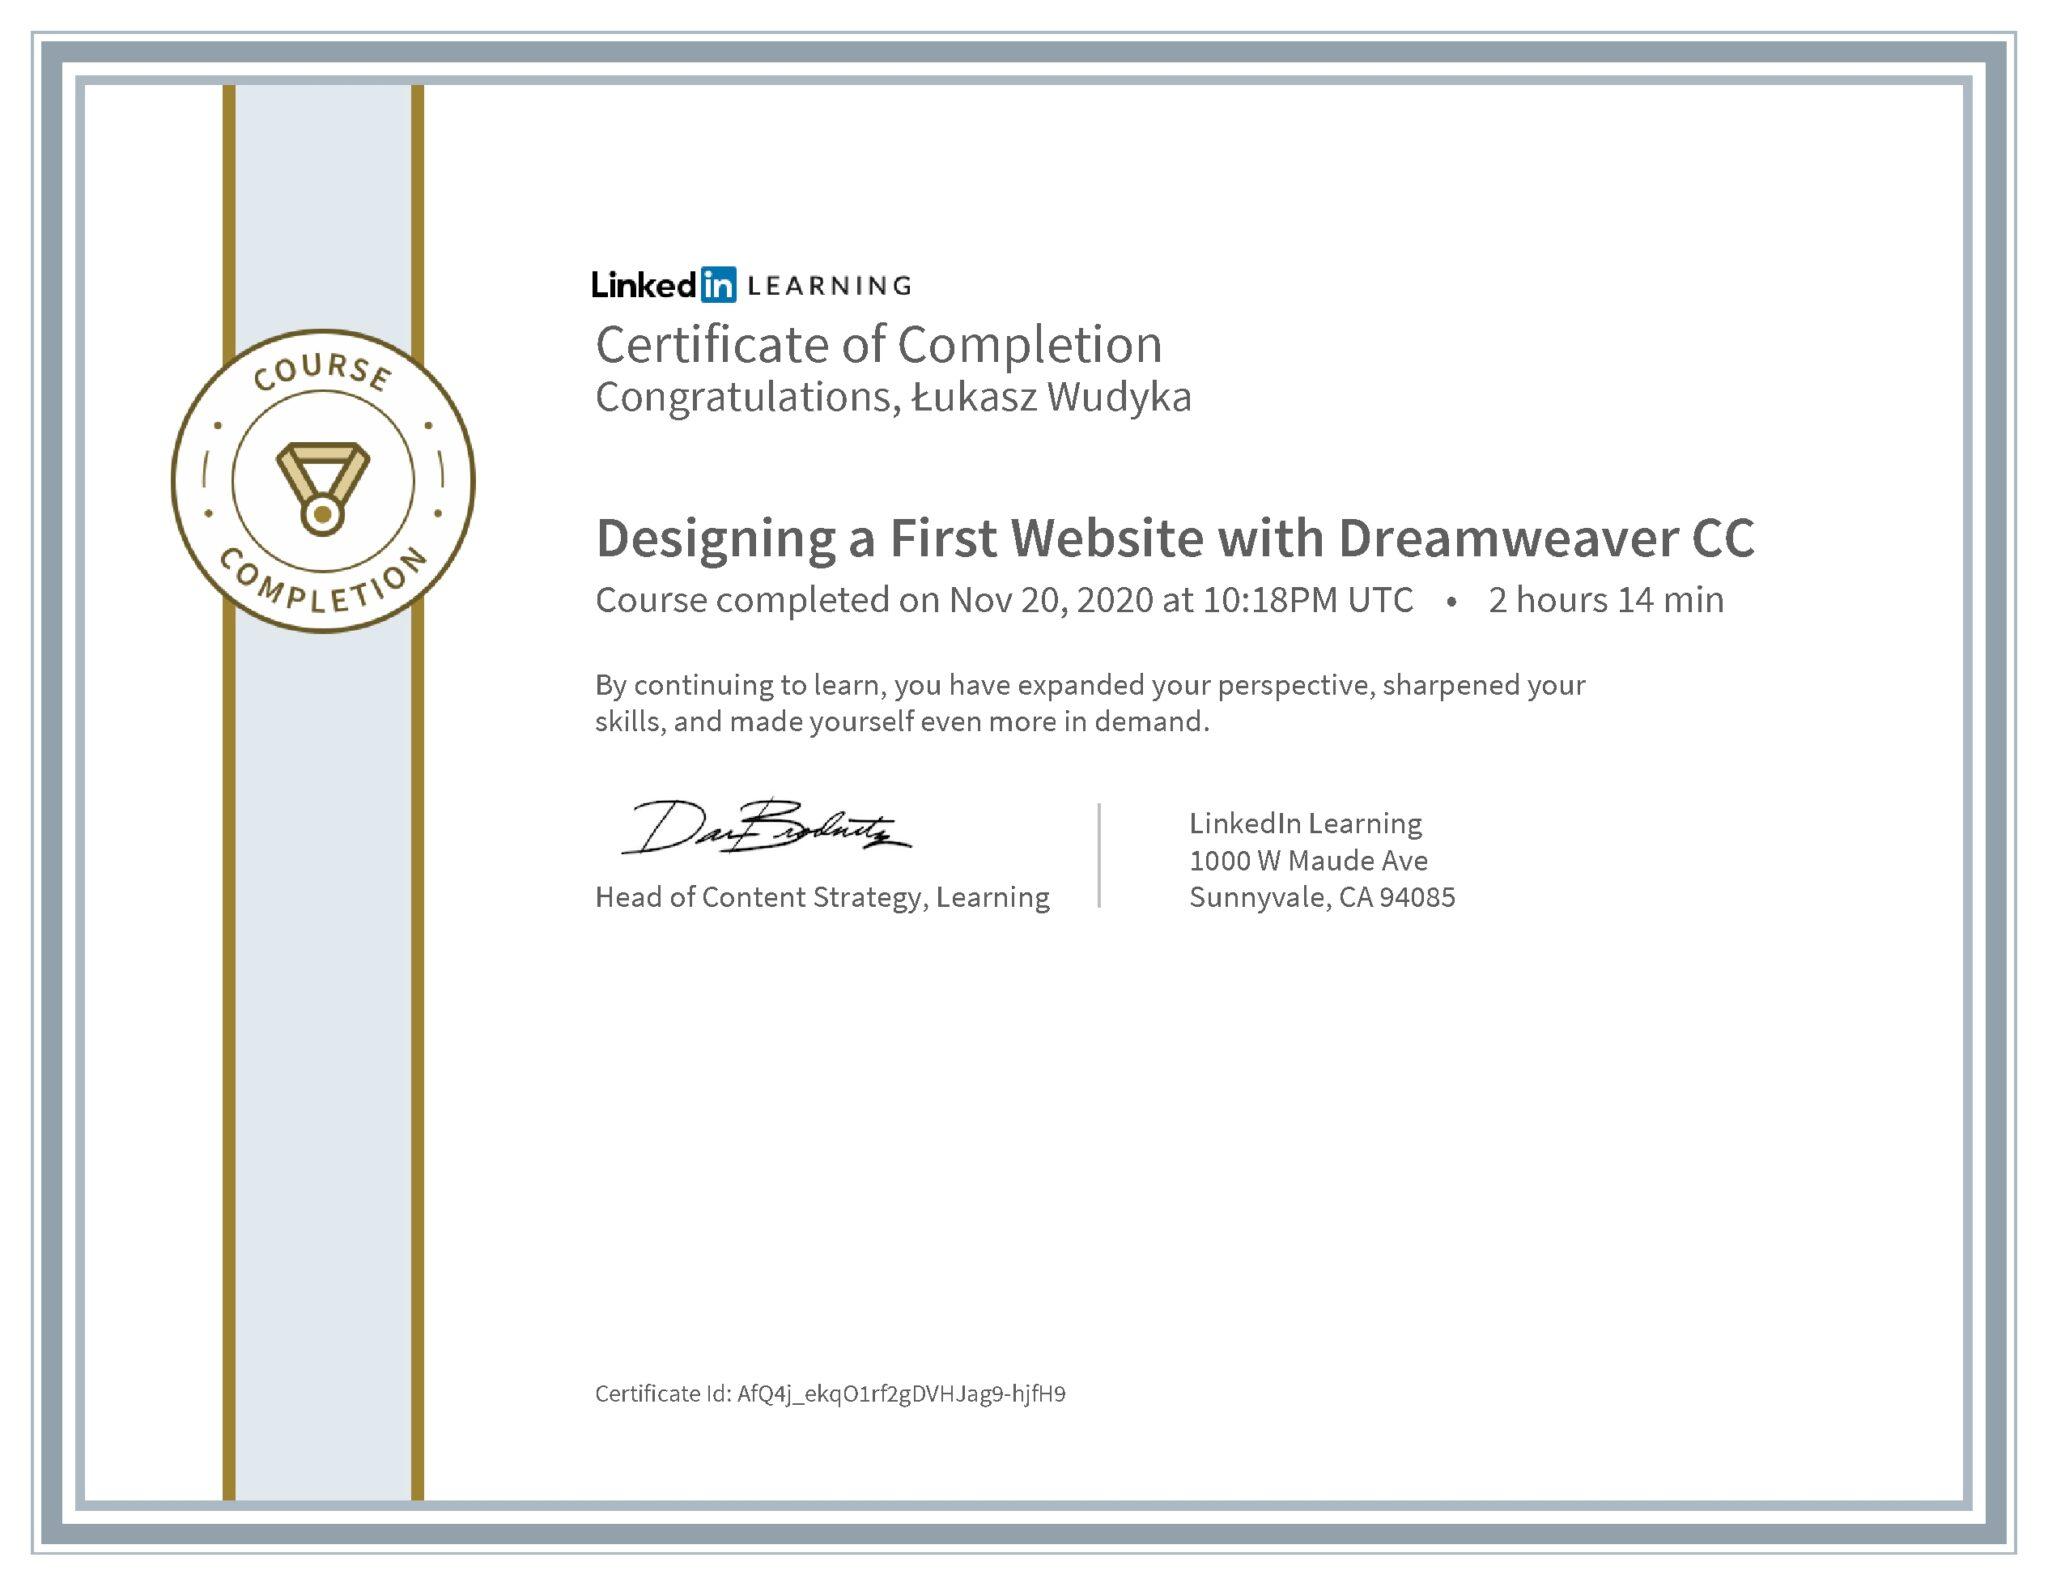 Łukasz Wudyka certyfikat LinkedIn Designing a First Website with Dreamweaver CC